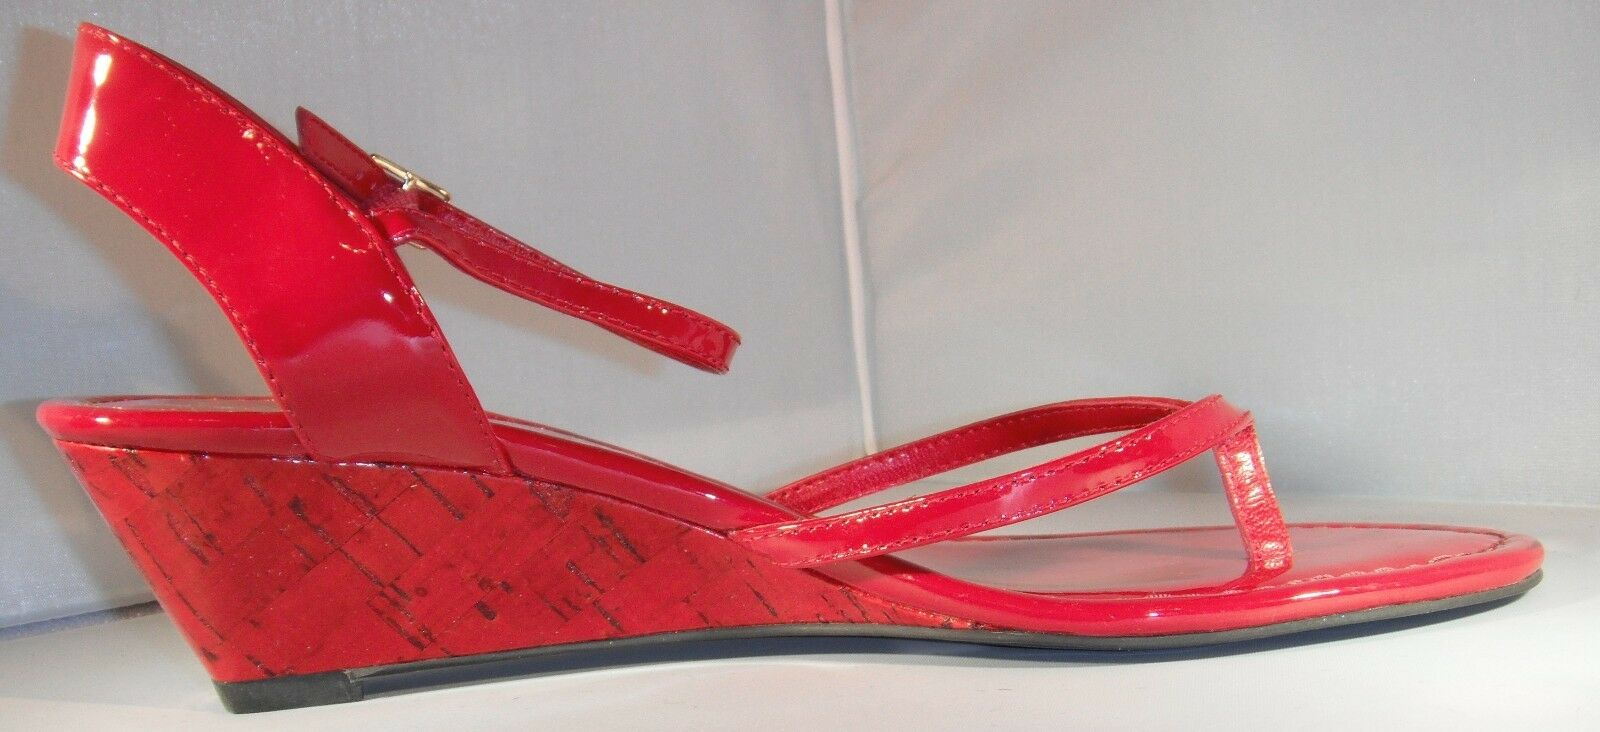 sconti e altro NIB Lauren Ralph Lauren Laila Mary Jane Jane Jane Wedge Sandal scarpe sz 6M  rivenditore di fitness